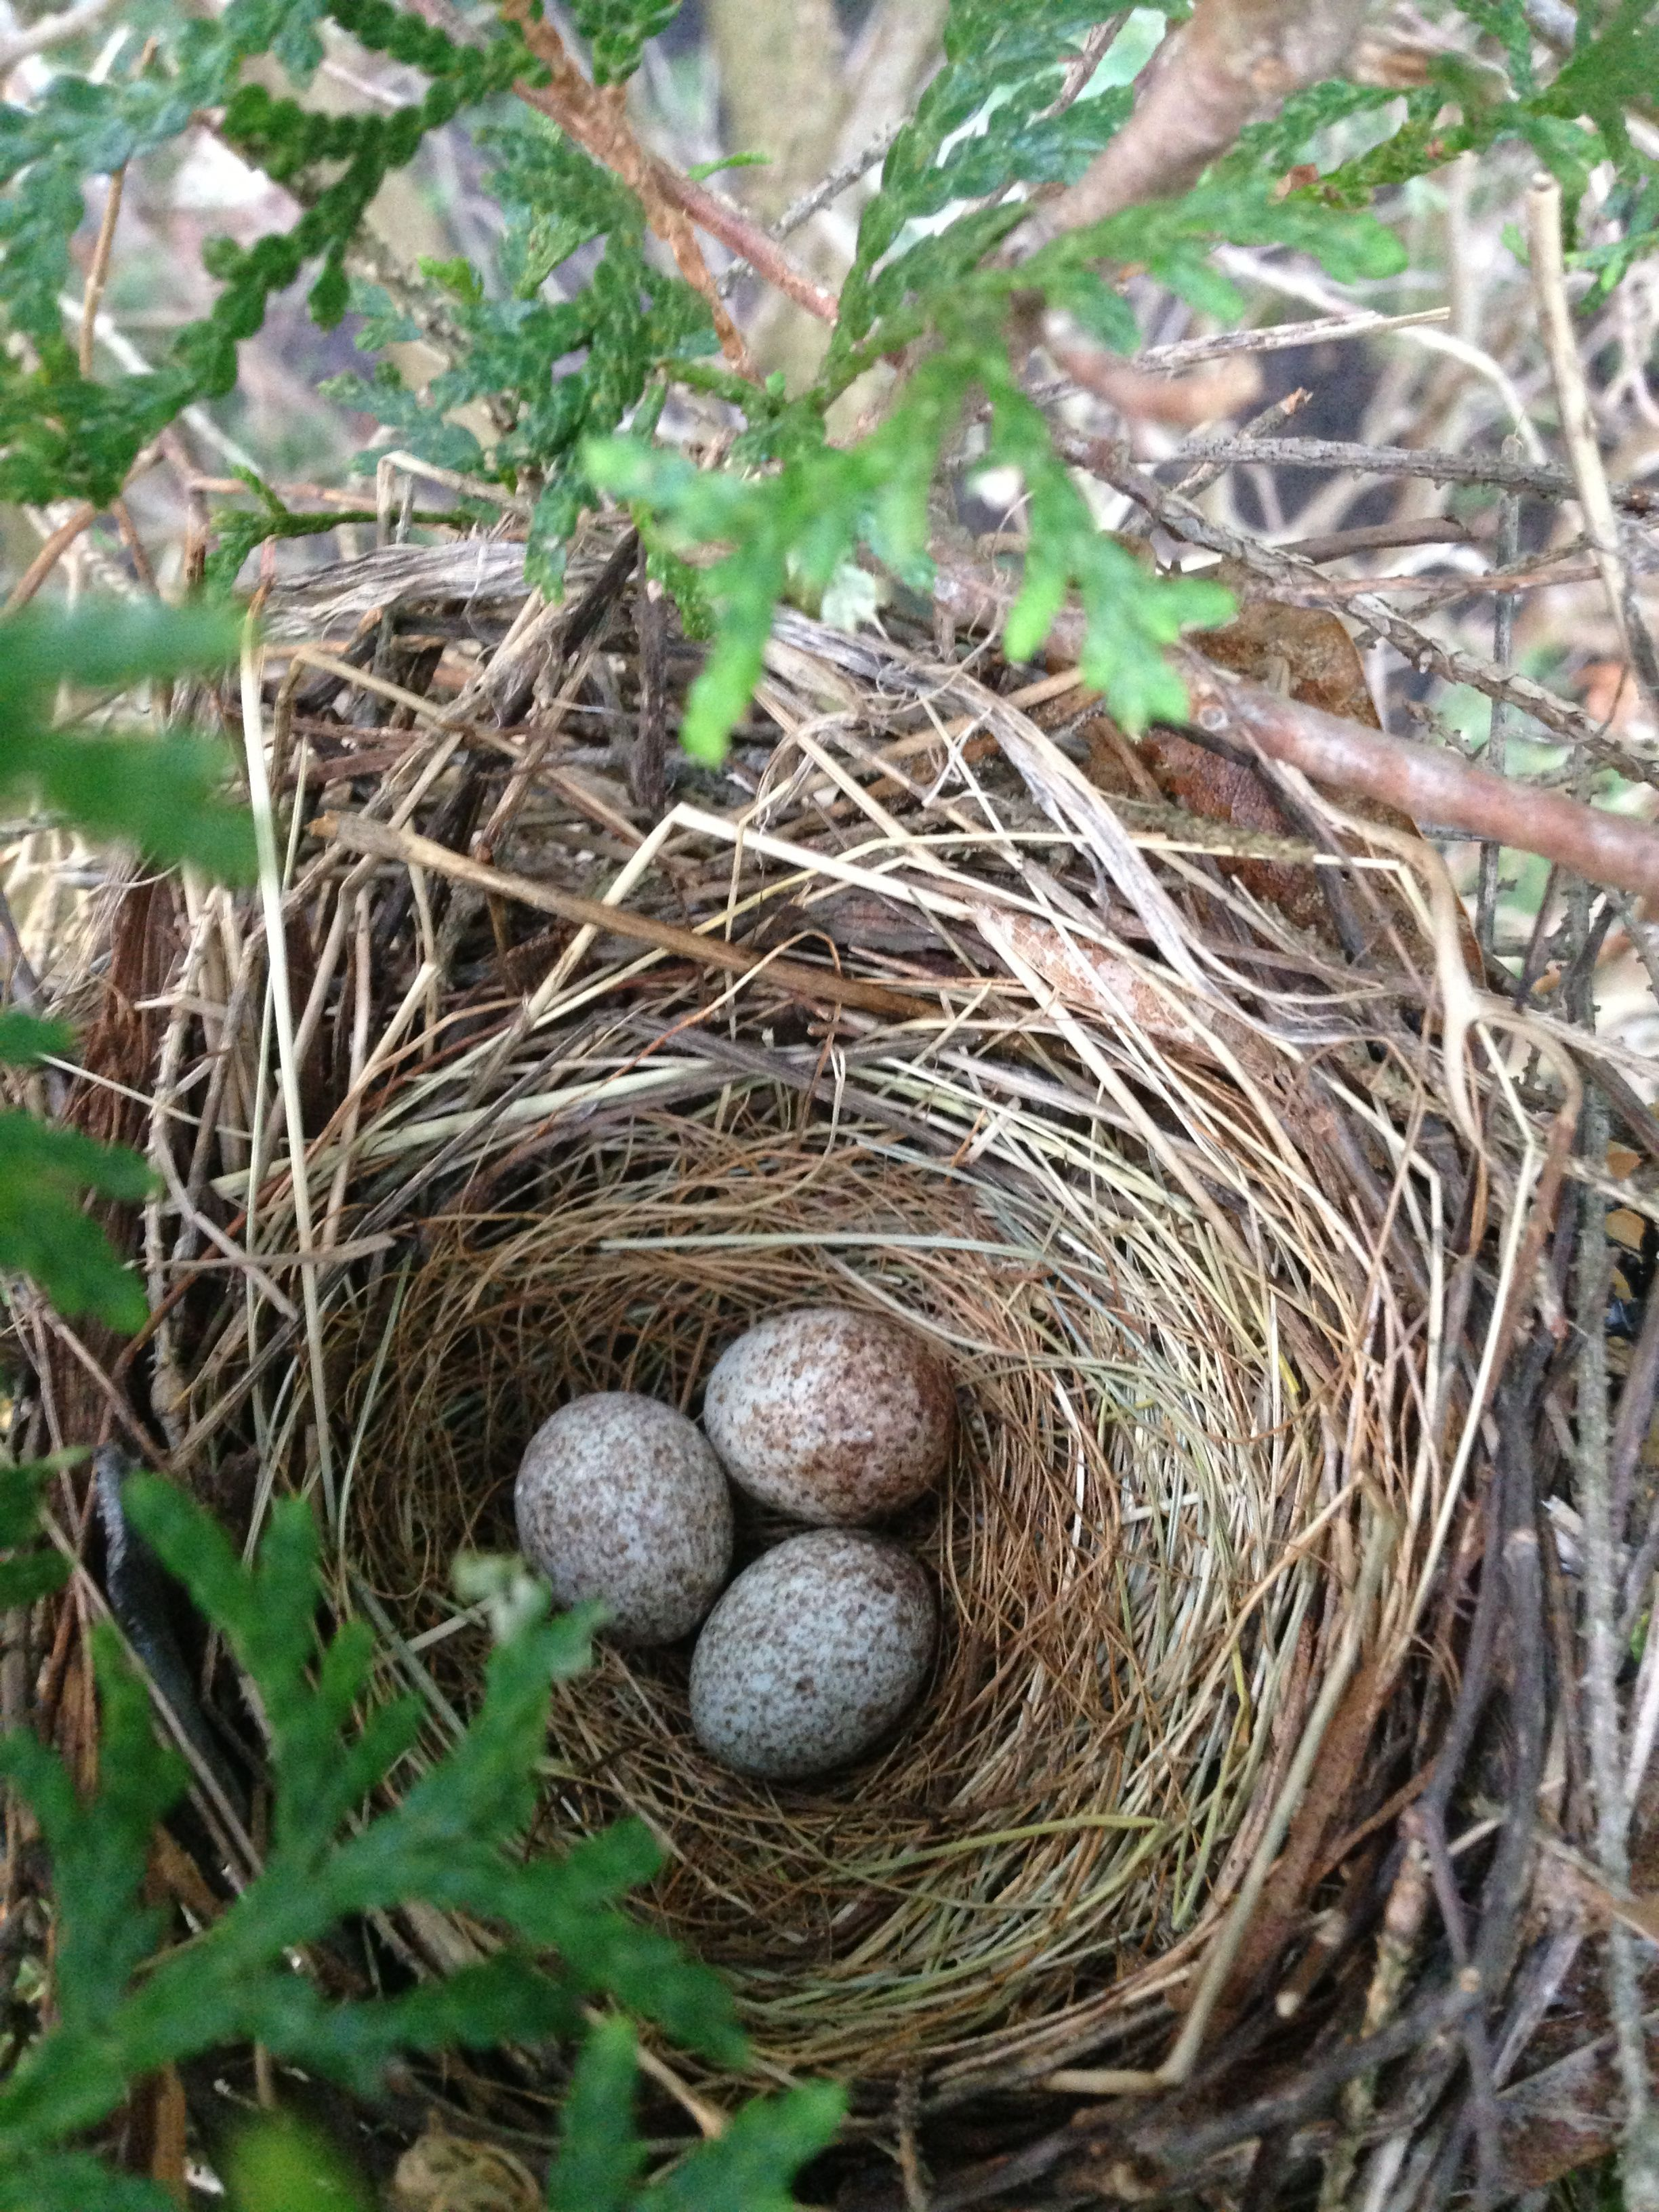 Cardinal Nest Bird Eggs Nest Birdhouses Rustic